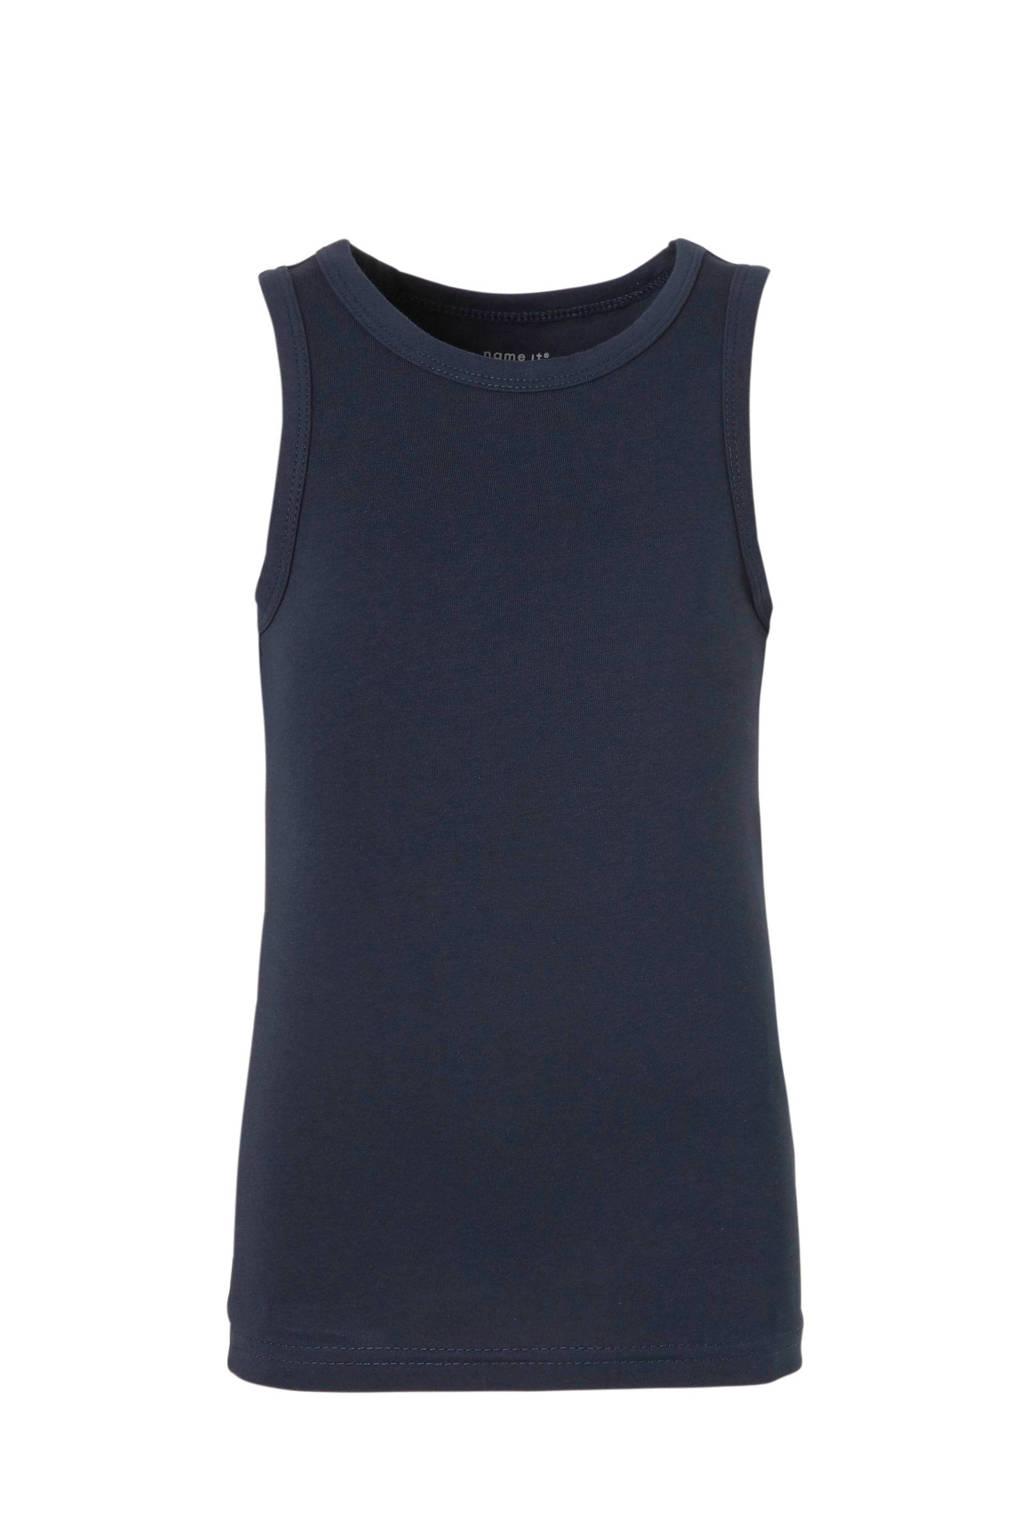 NAME IT MINI hemd - set van 2, Grijs melange/ donkerblauw